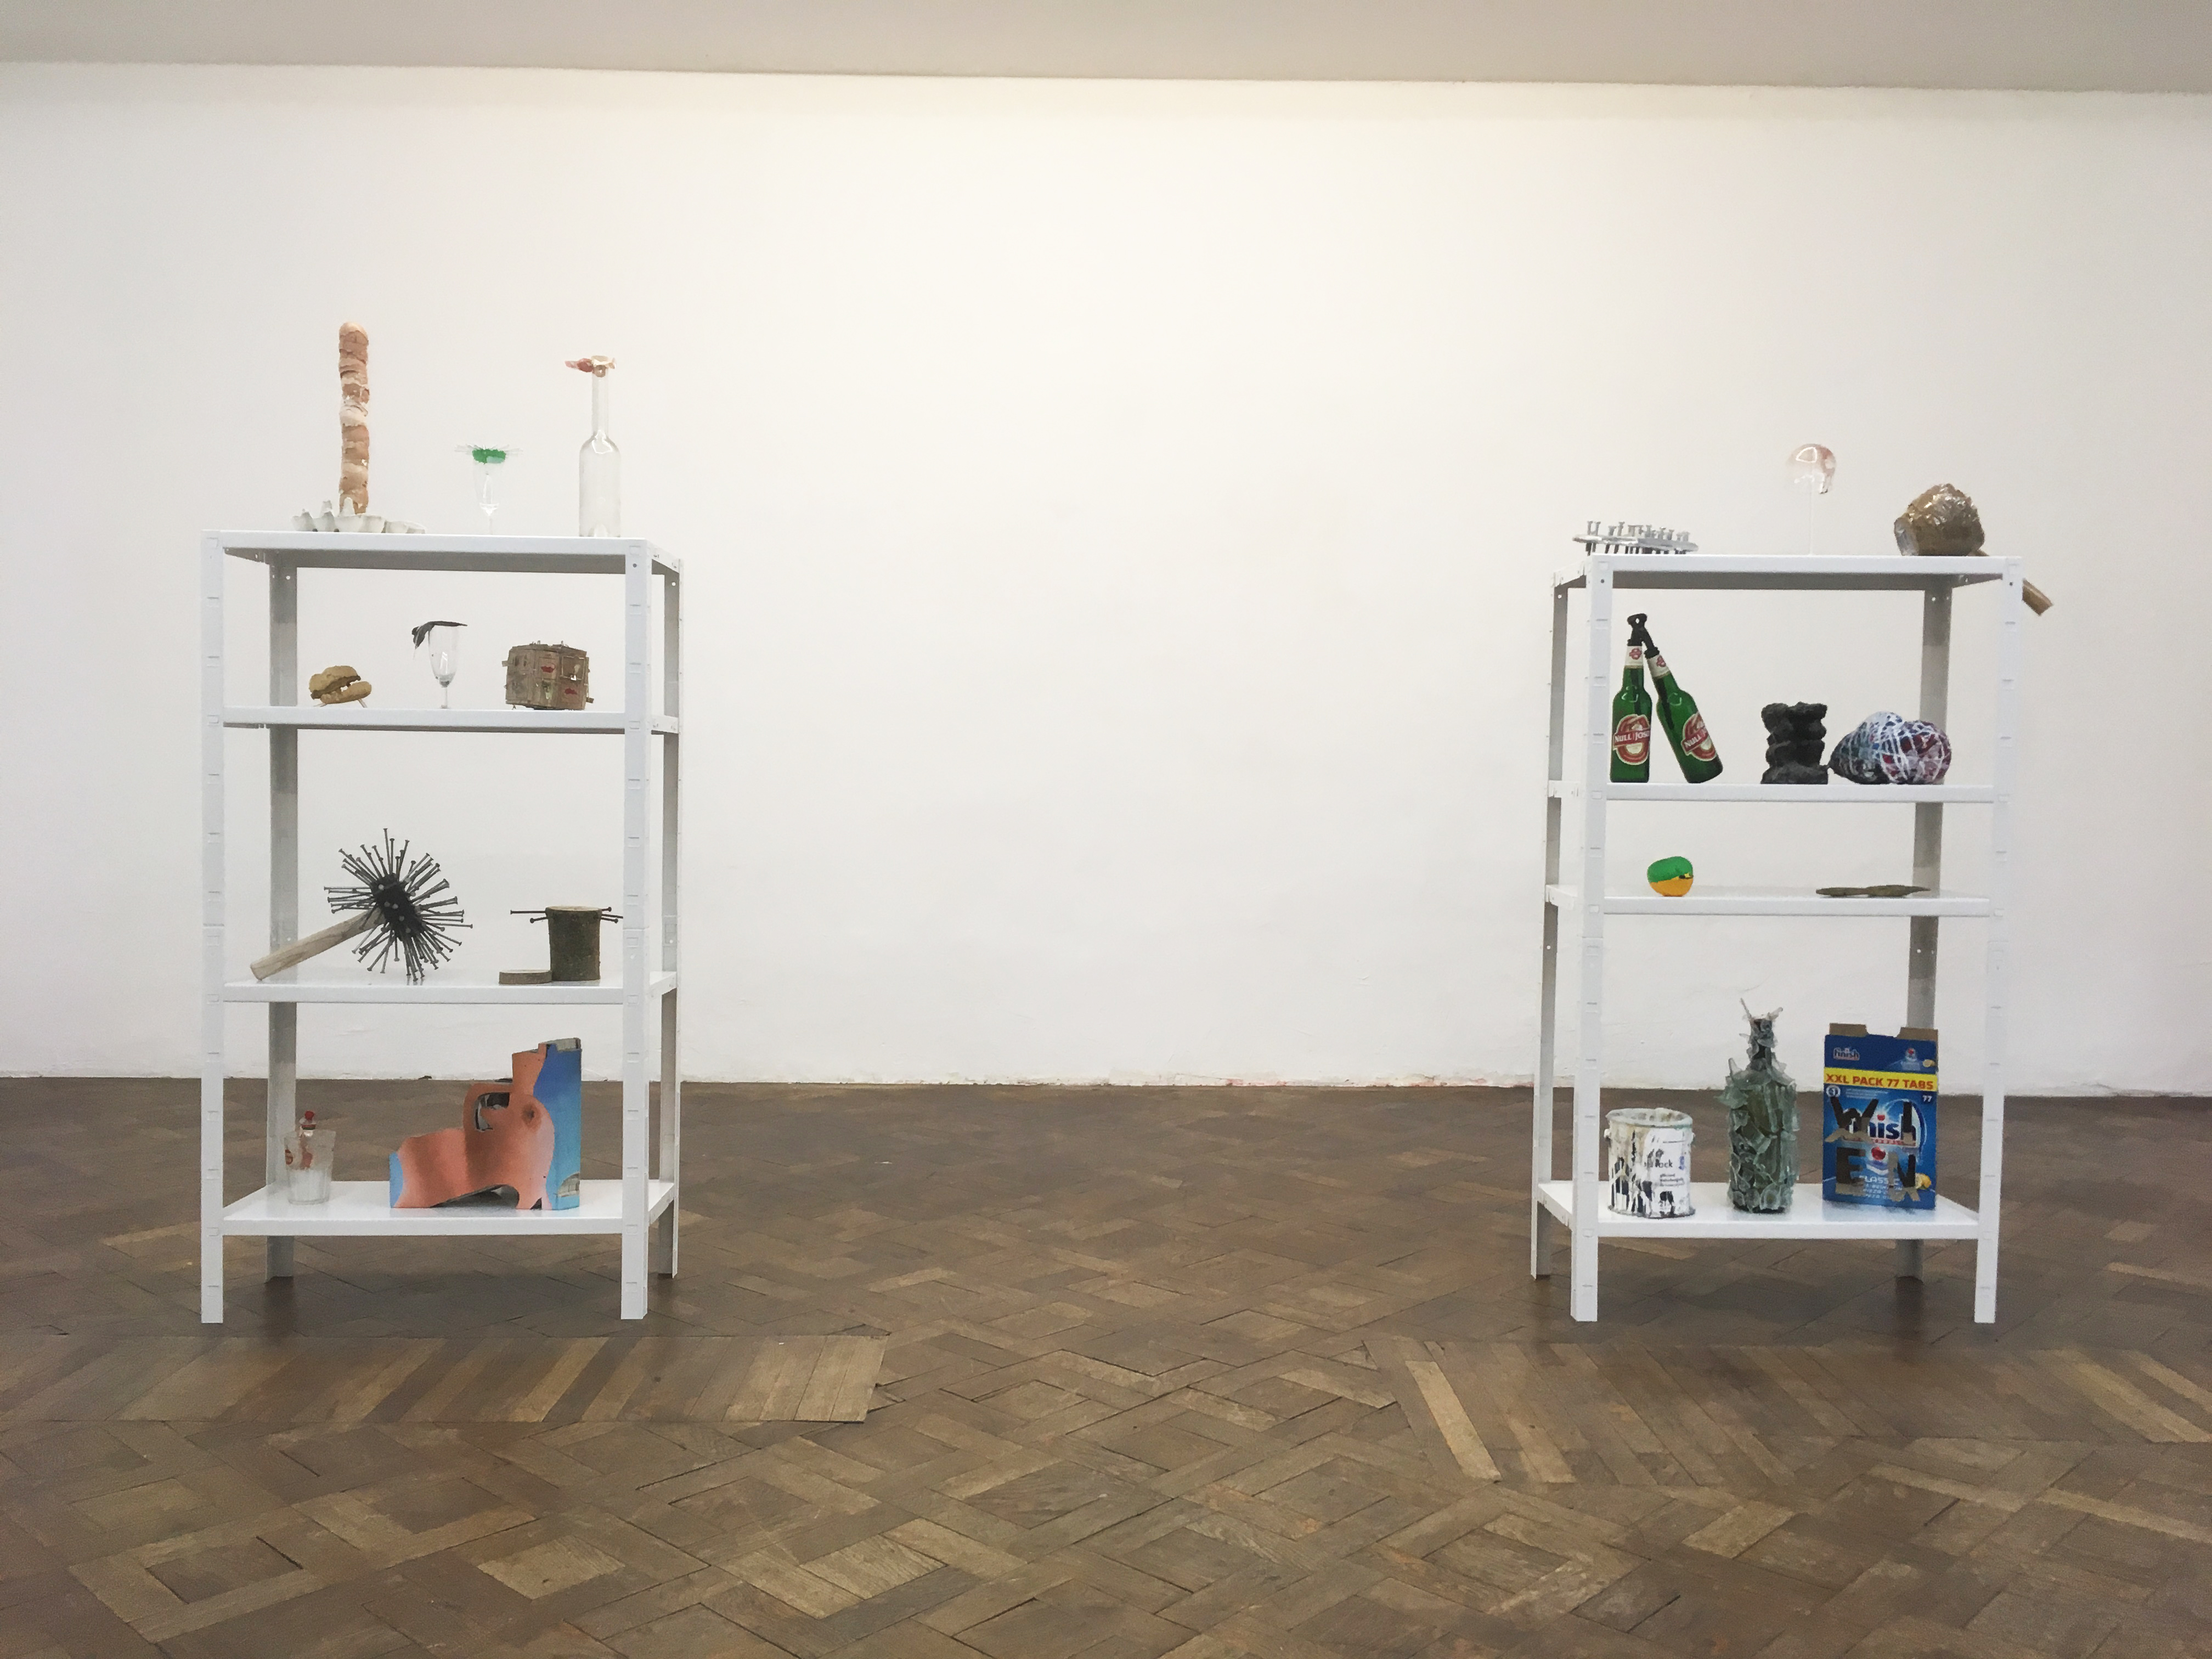 Installationsansicht, Christian Eisenberger, Skulpturenpark, Büro Weltausstellung, 2018